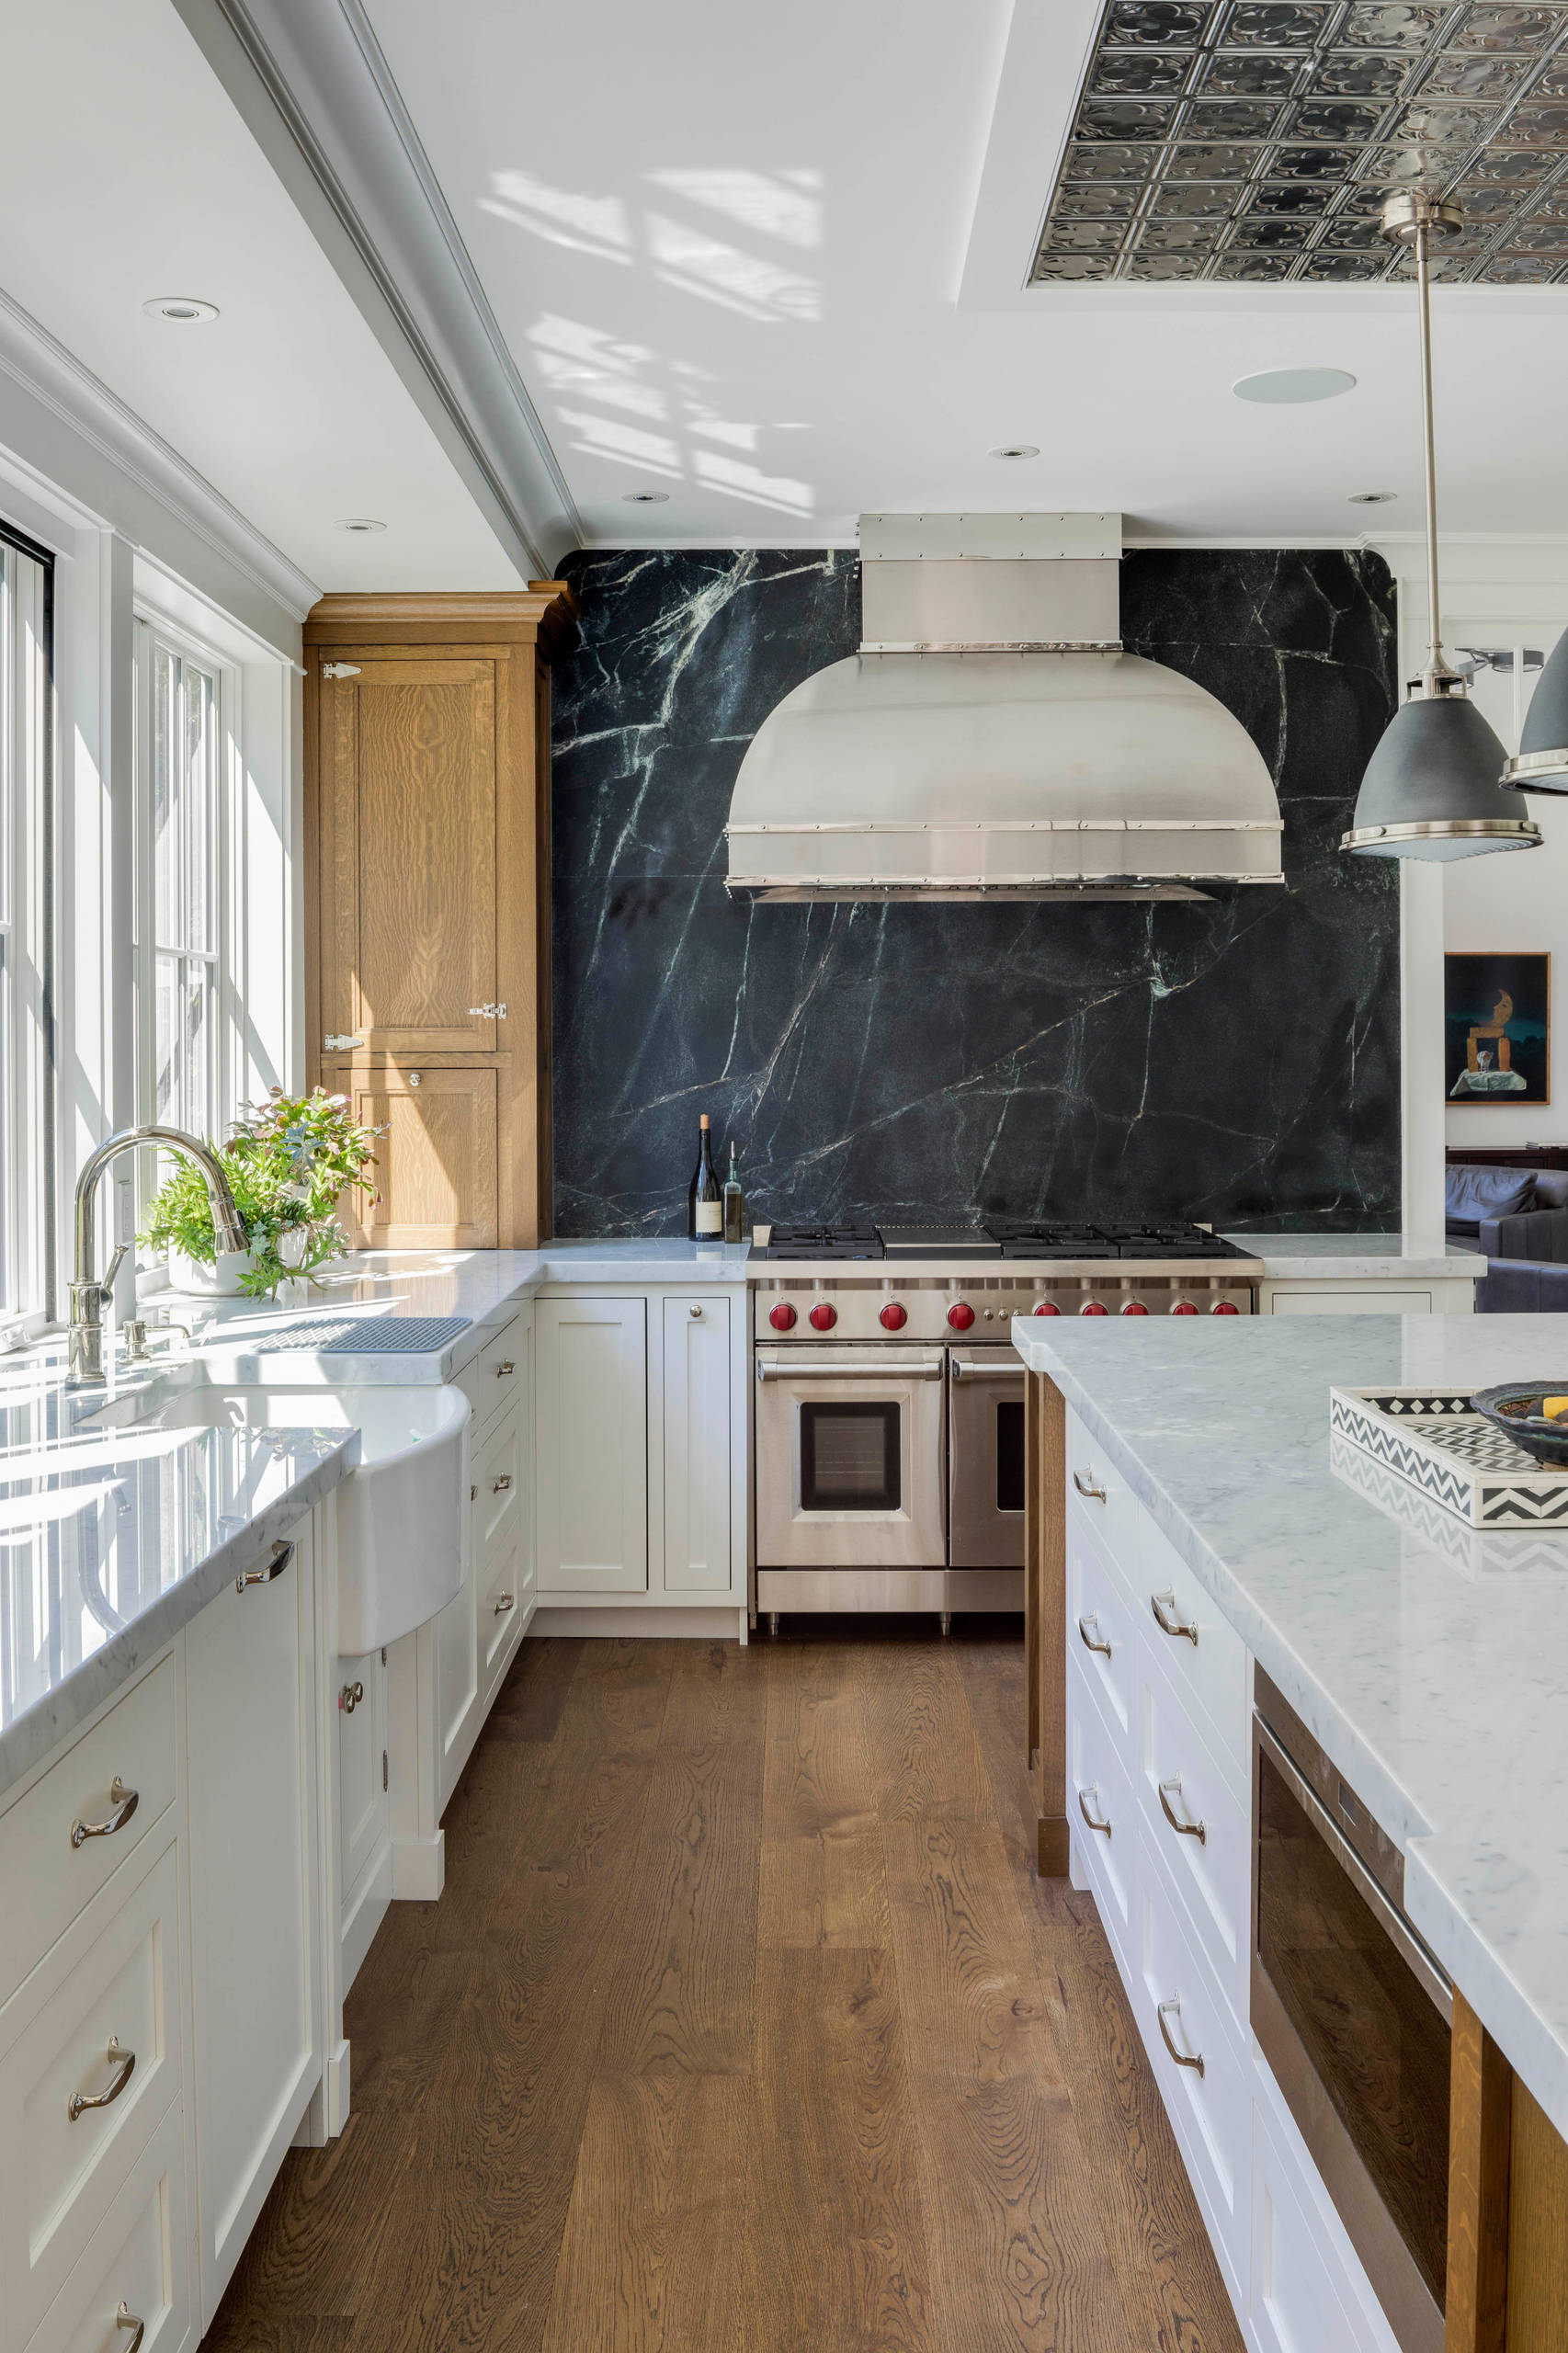 75 Beautiful Kitchen With Black Backsplash Pictures Ideas November 2020 Houzz